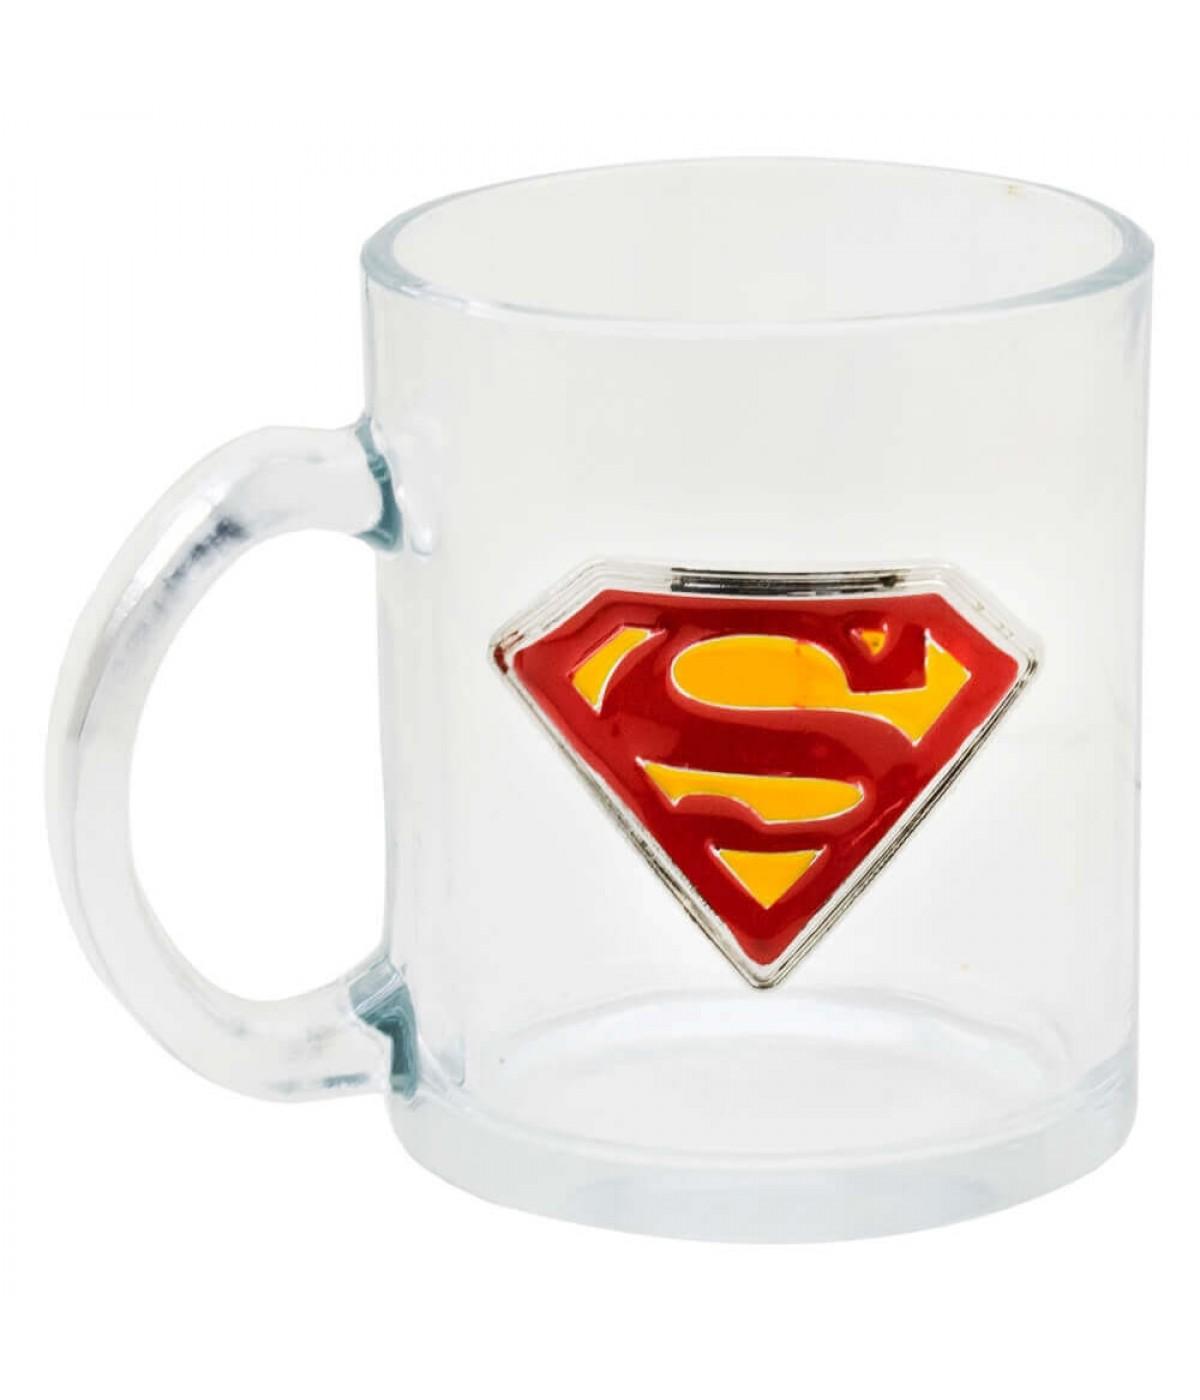 Caneca Vidro Brasão Metal Superman 370ml - Liga Da Justiça